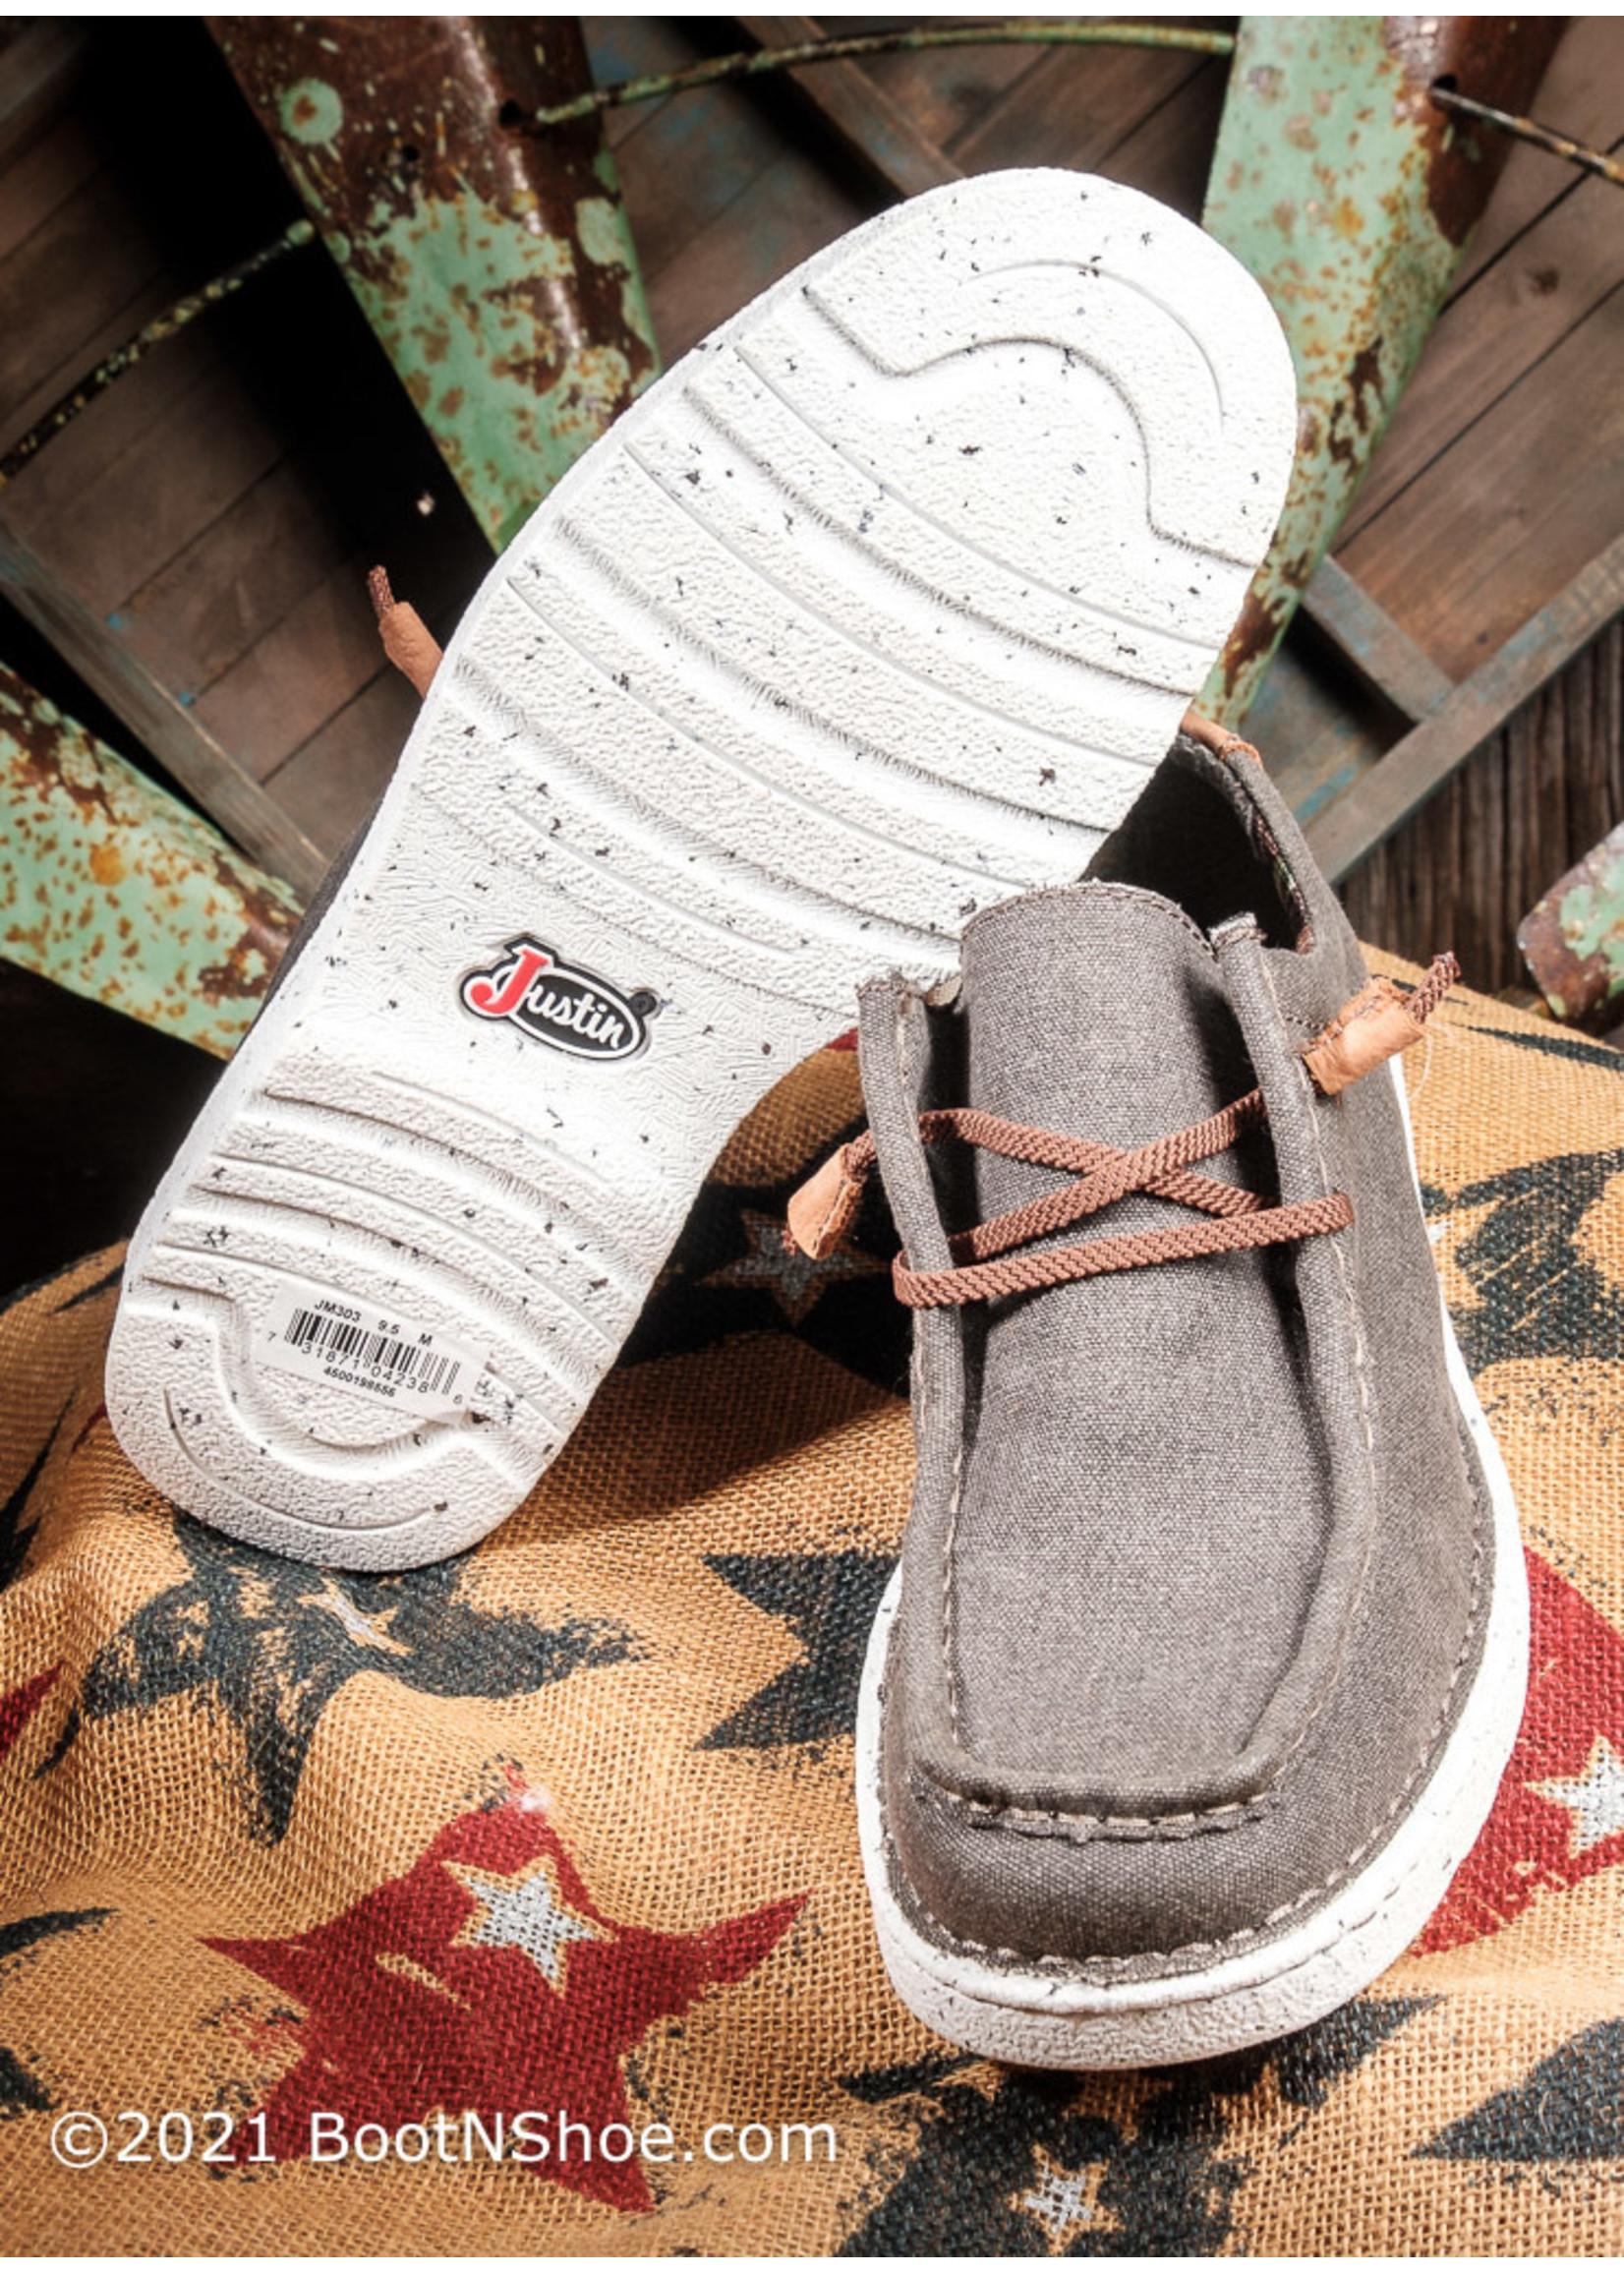 Justin Boots Men's Hazer Clay Canvas Moc Toe Shoe JM302